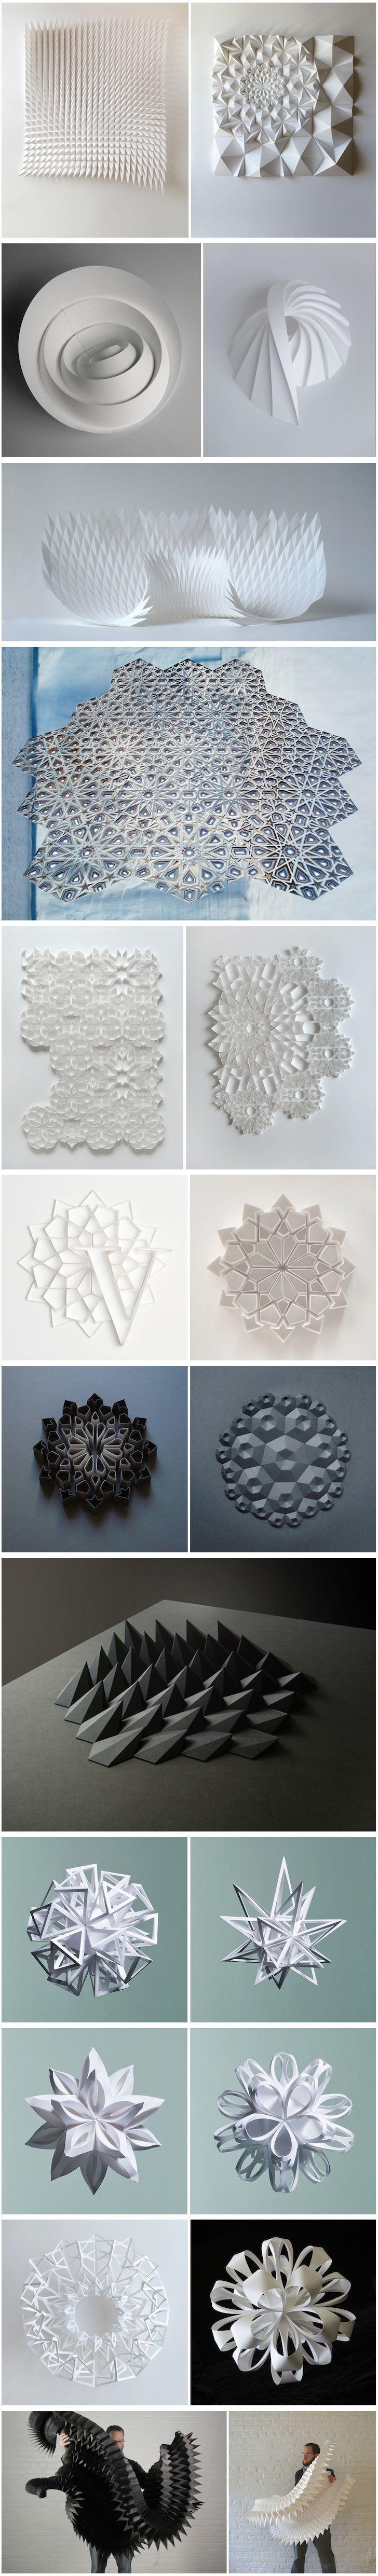 Geometric Paper Sculptures: